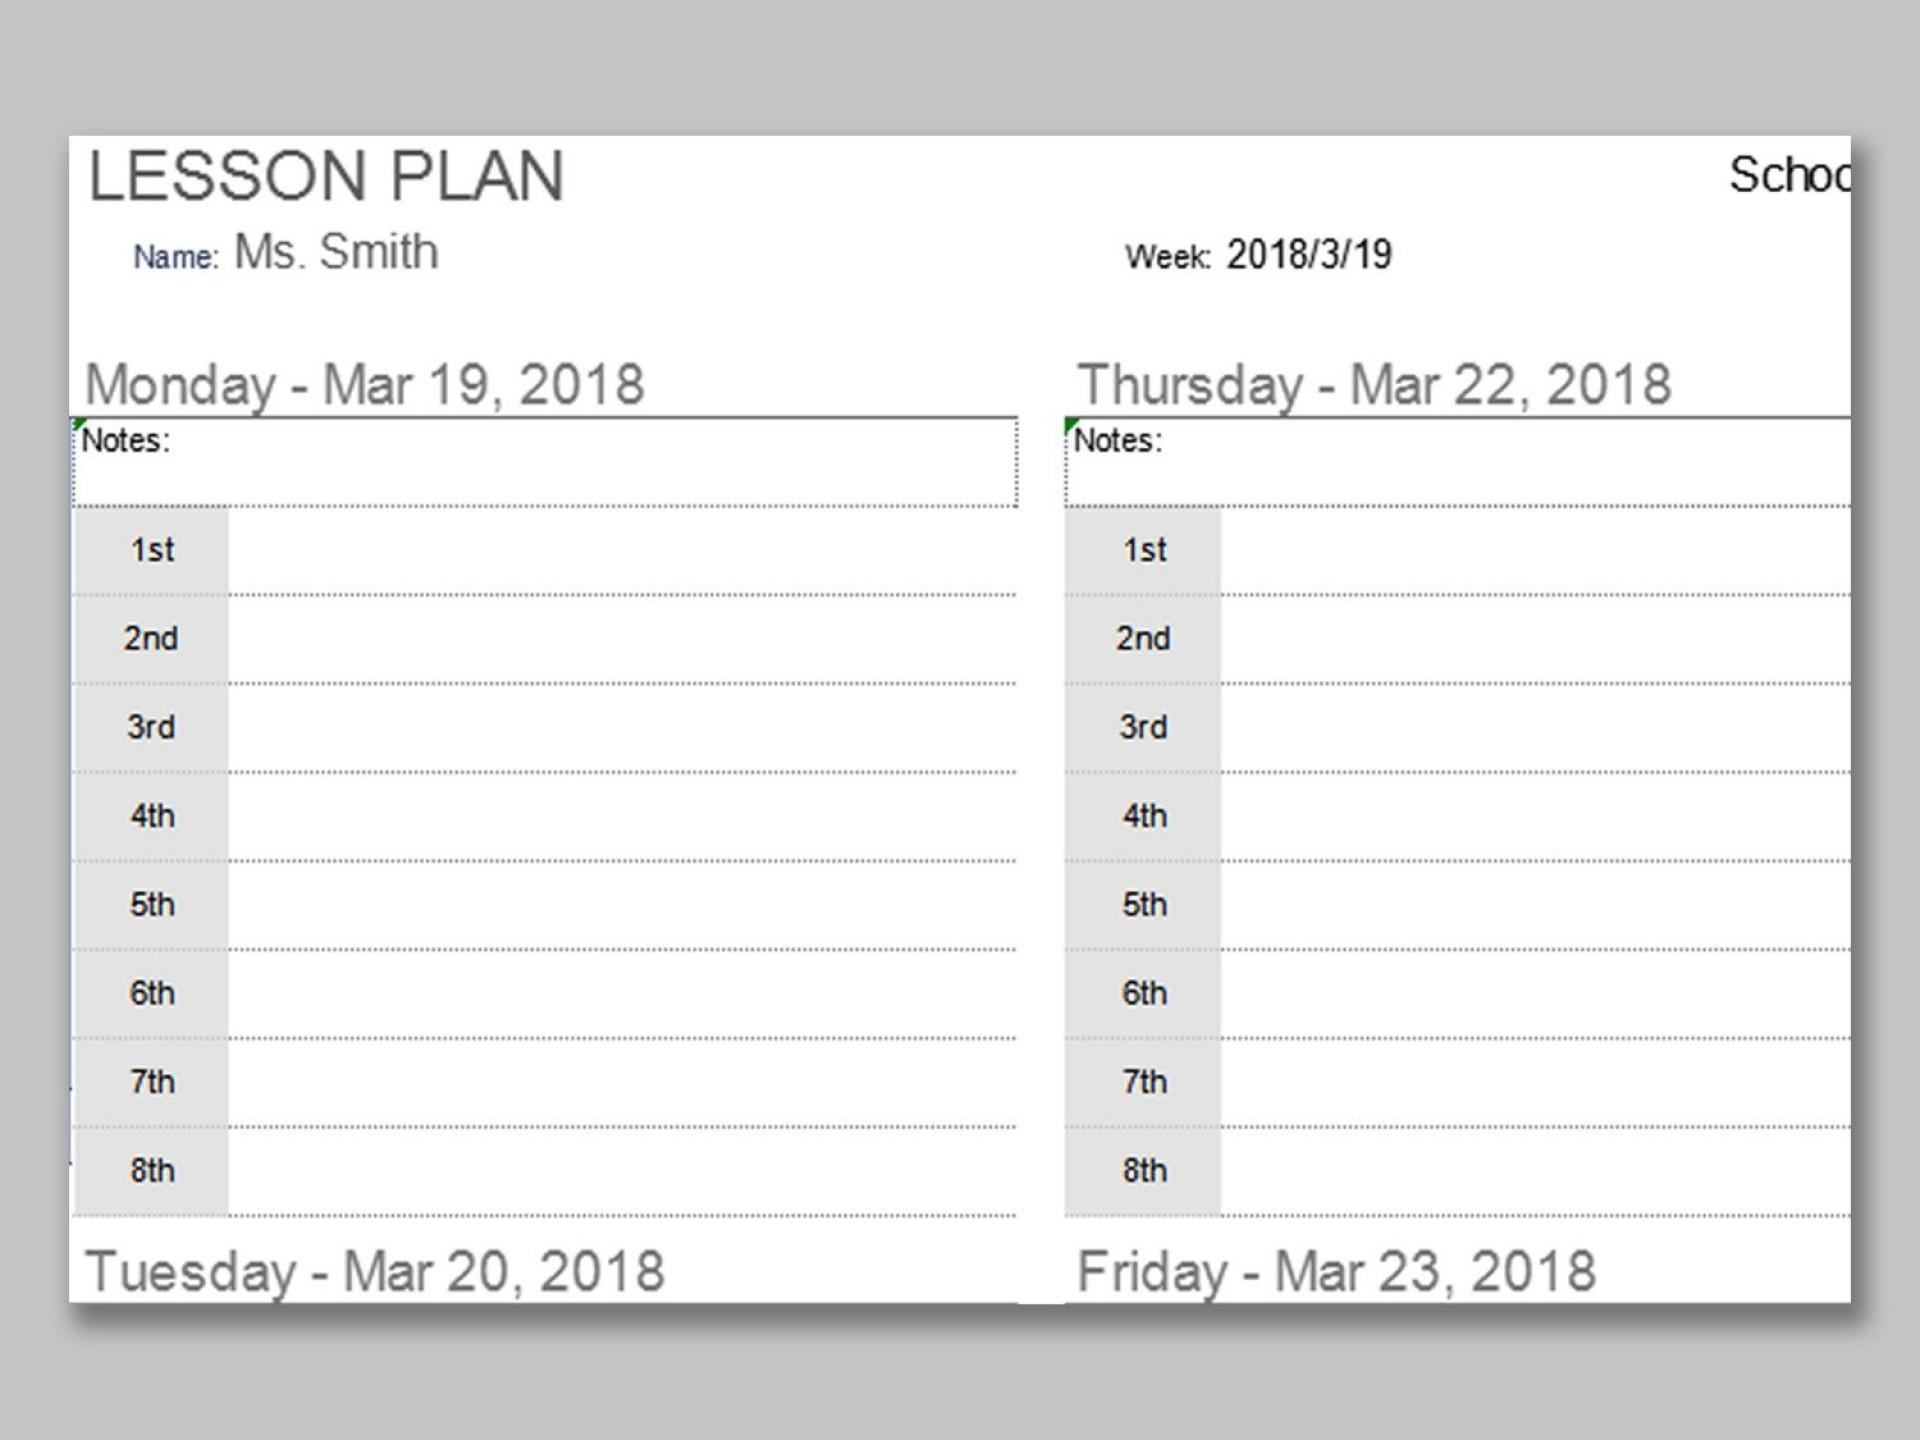 000 Simple Free Lesson Plan Template Photo  Templates Editable For Preschool Google Doc1920